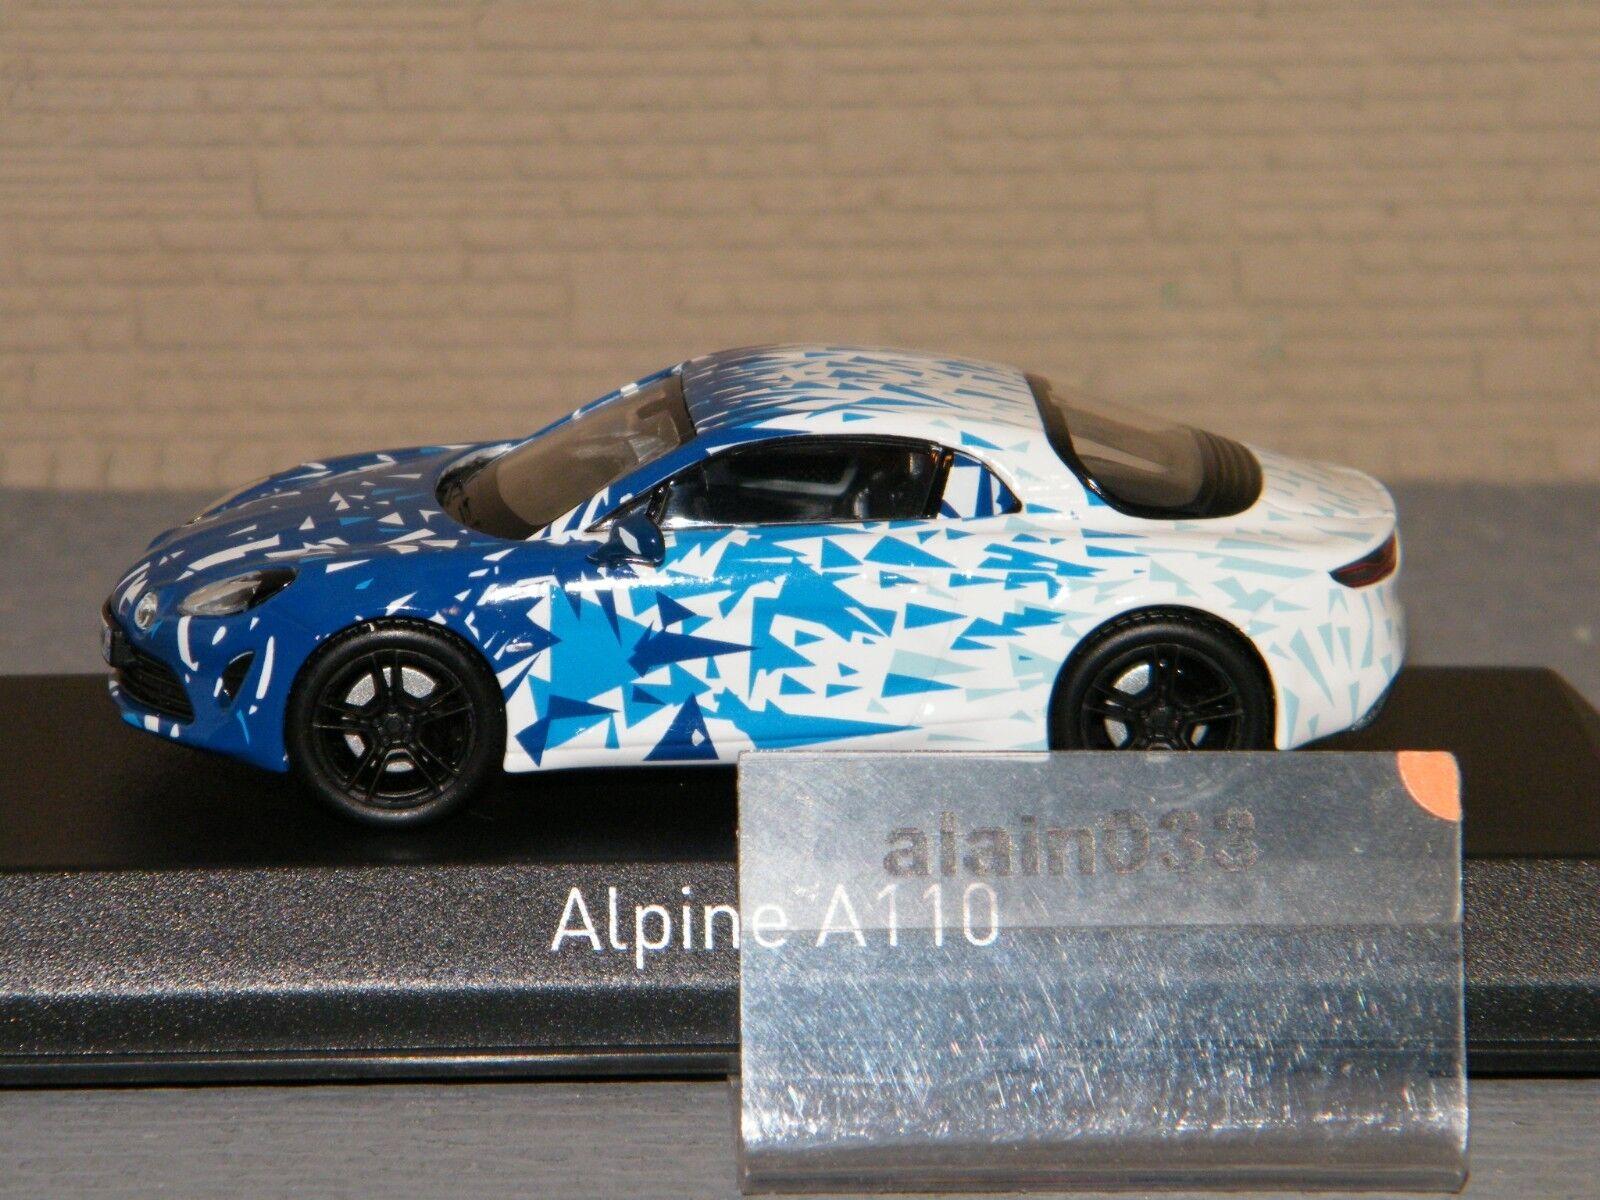 ALPINE A110 2017 blanco & & & azul Test Version NOREV 1 43 Ref 517863 f87f5a